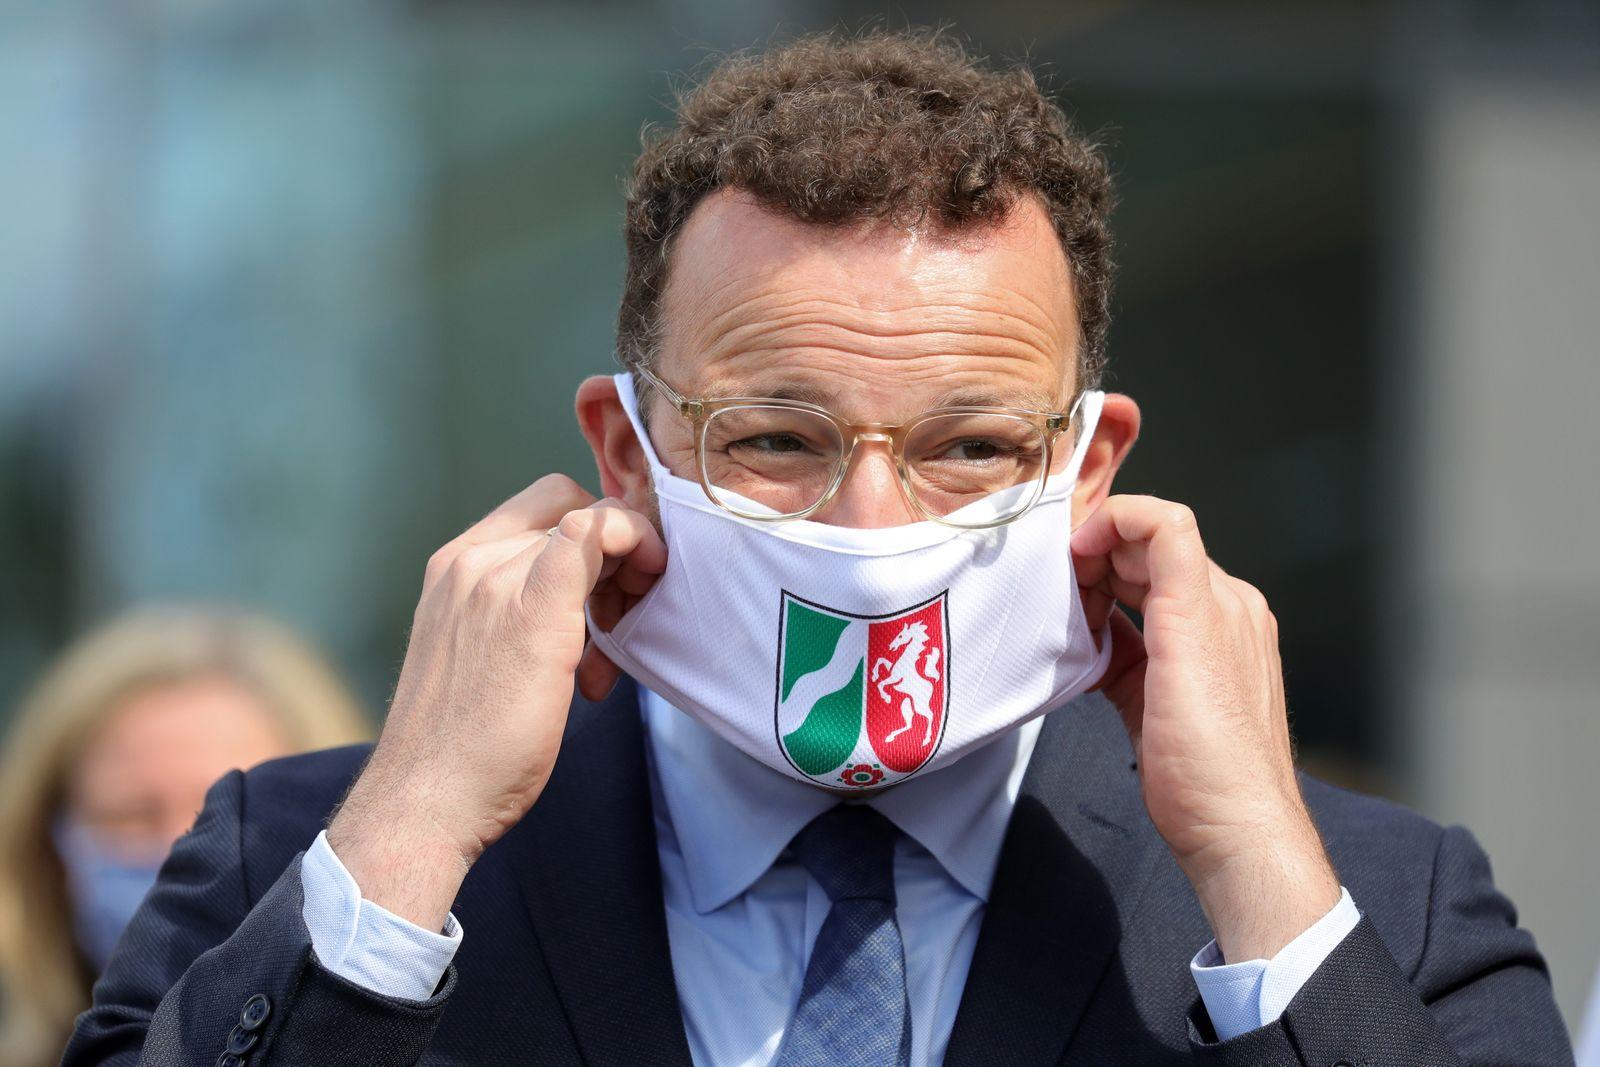 Health Minister Spahn Visits Hospital During The Coronavirus Pandemic